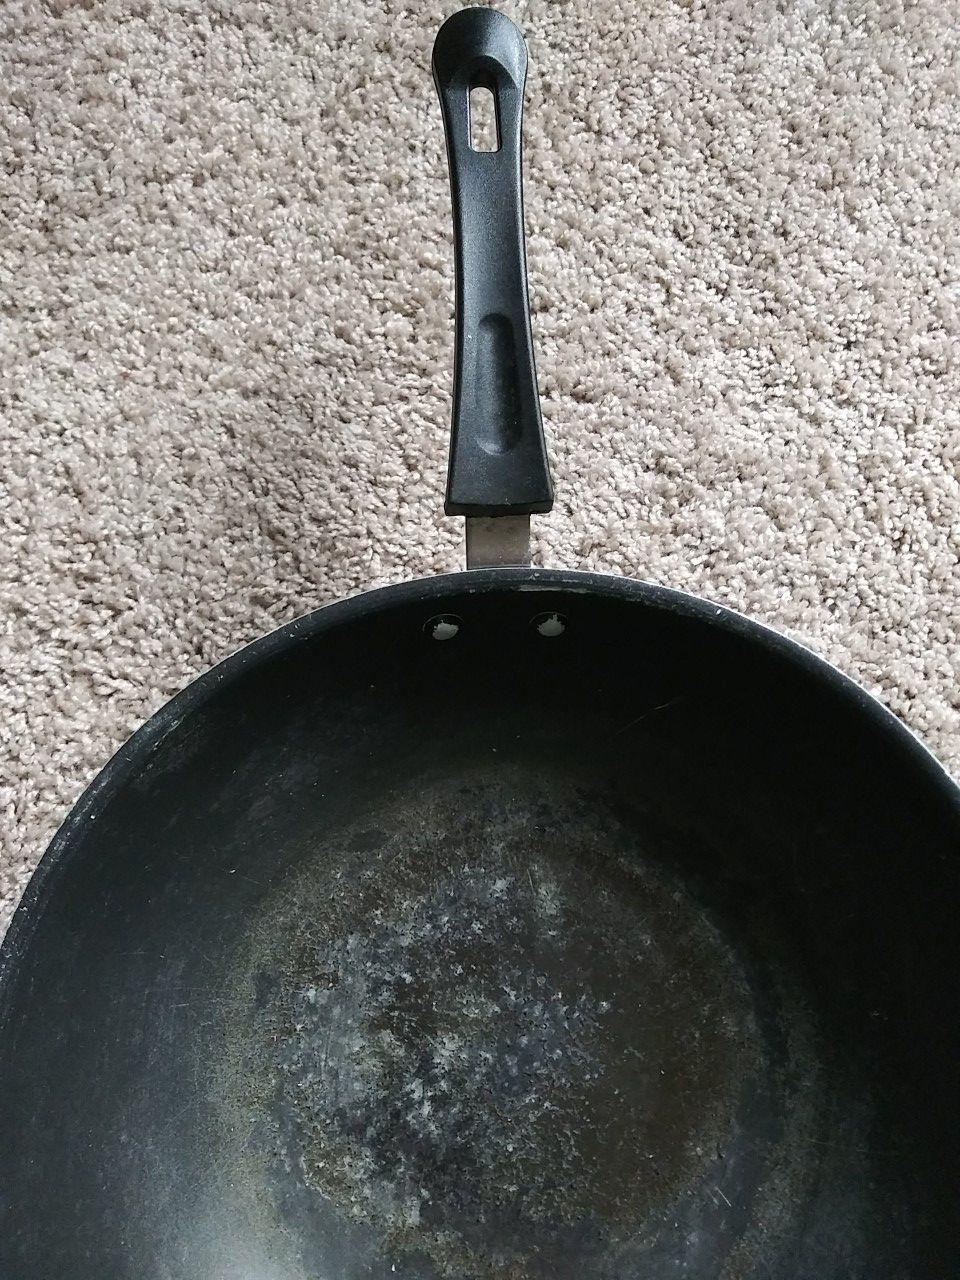 2 used ikea frying pans